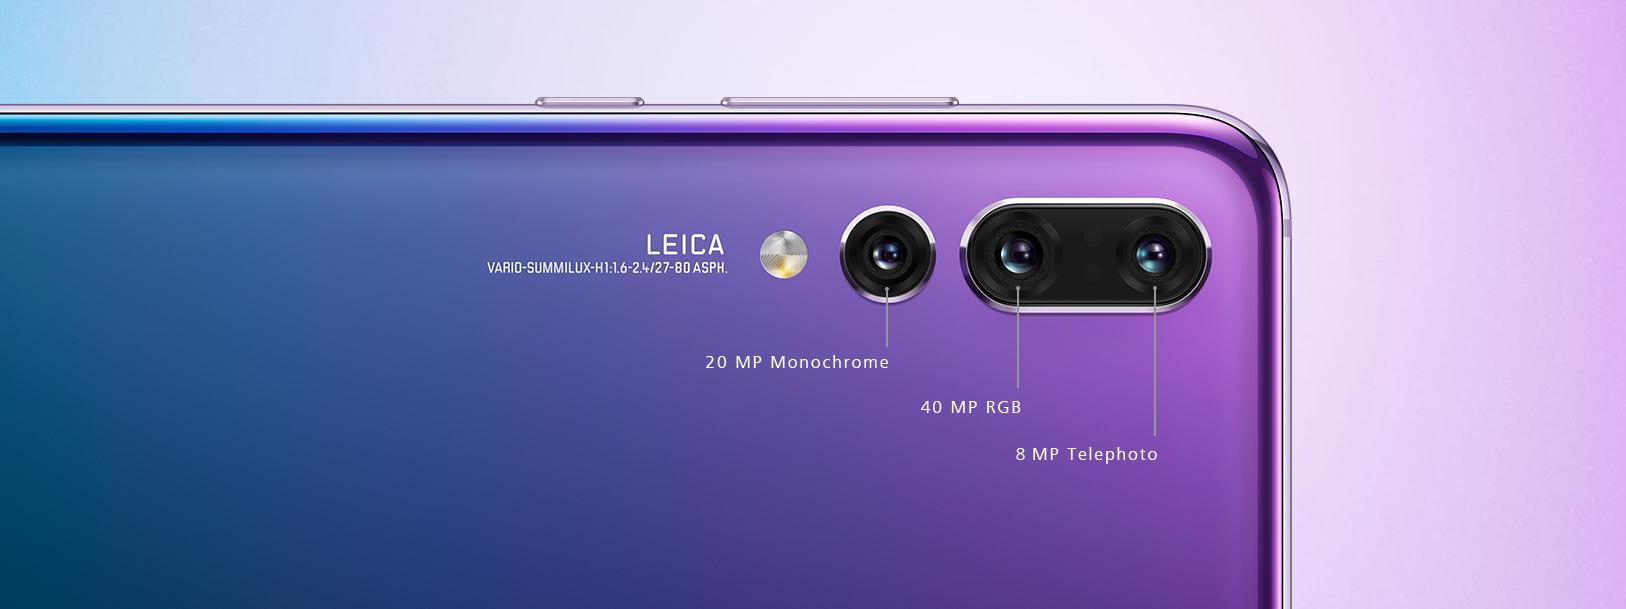 Камера смартфона Huawei P20 Pro